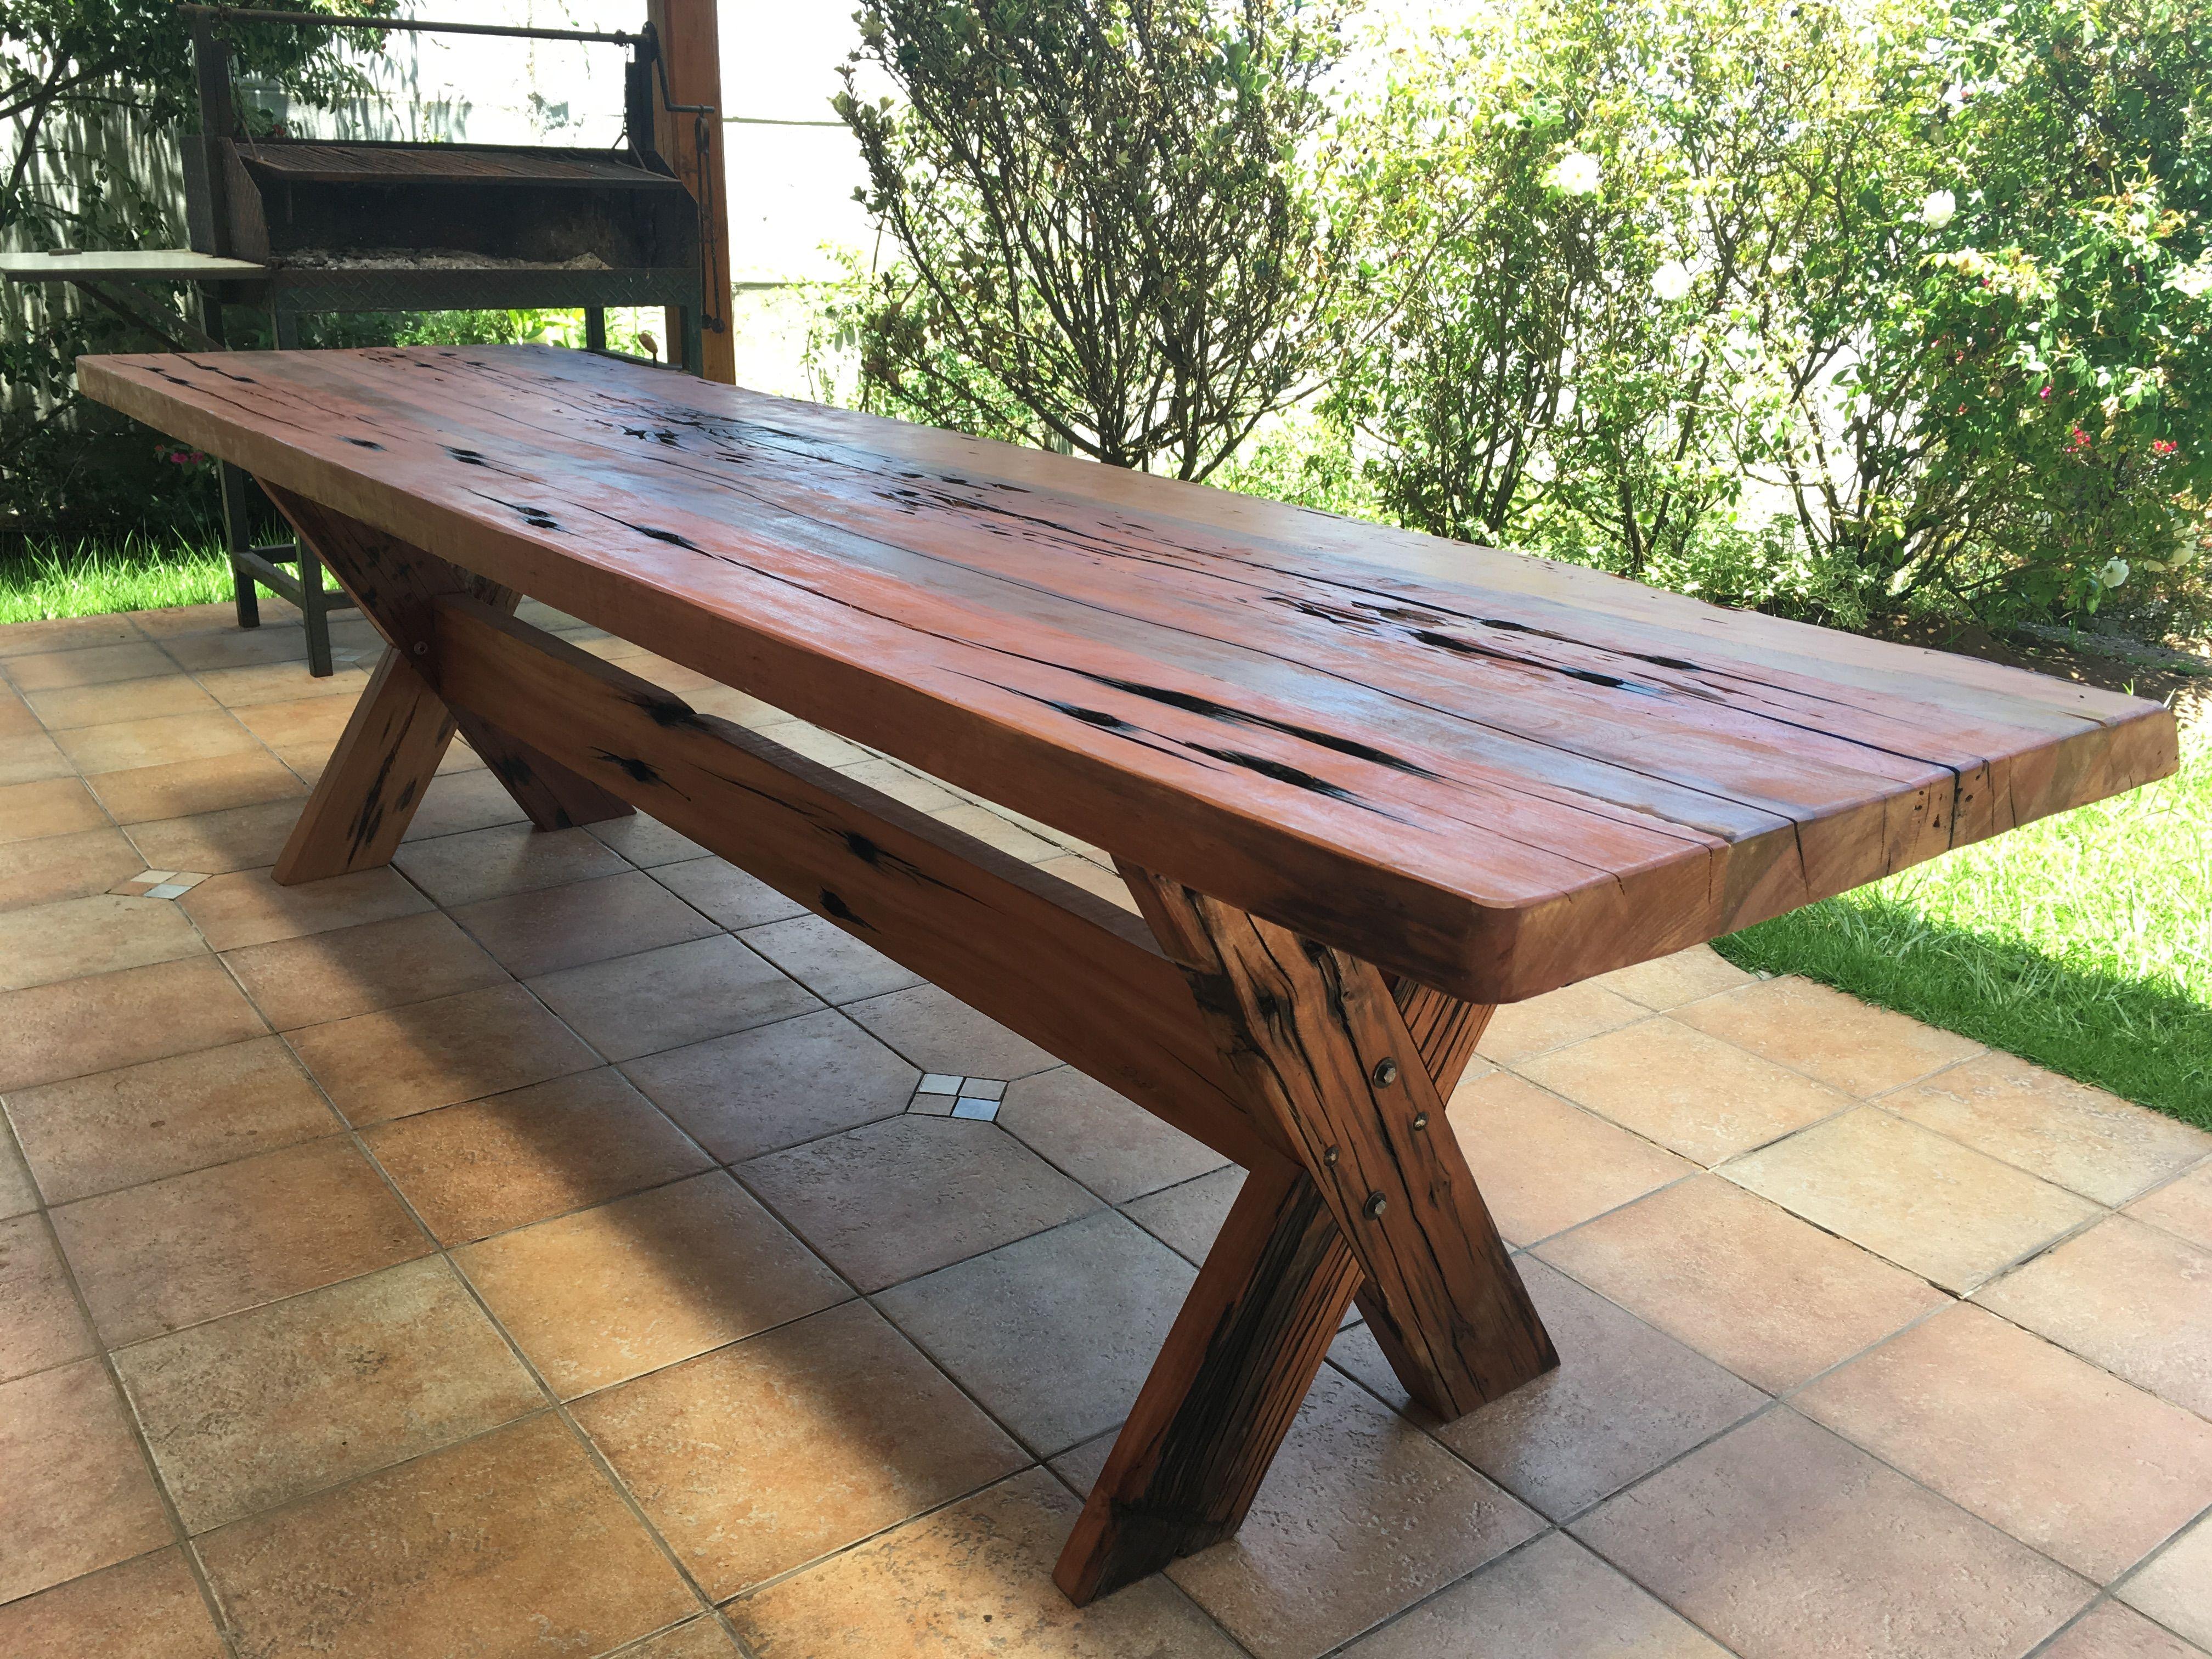 Mesa r stica de durmientes de roble ideal para quincho o - Mesas comedor rusticas ...